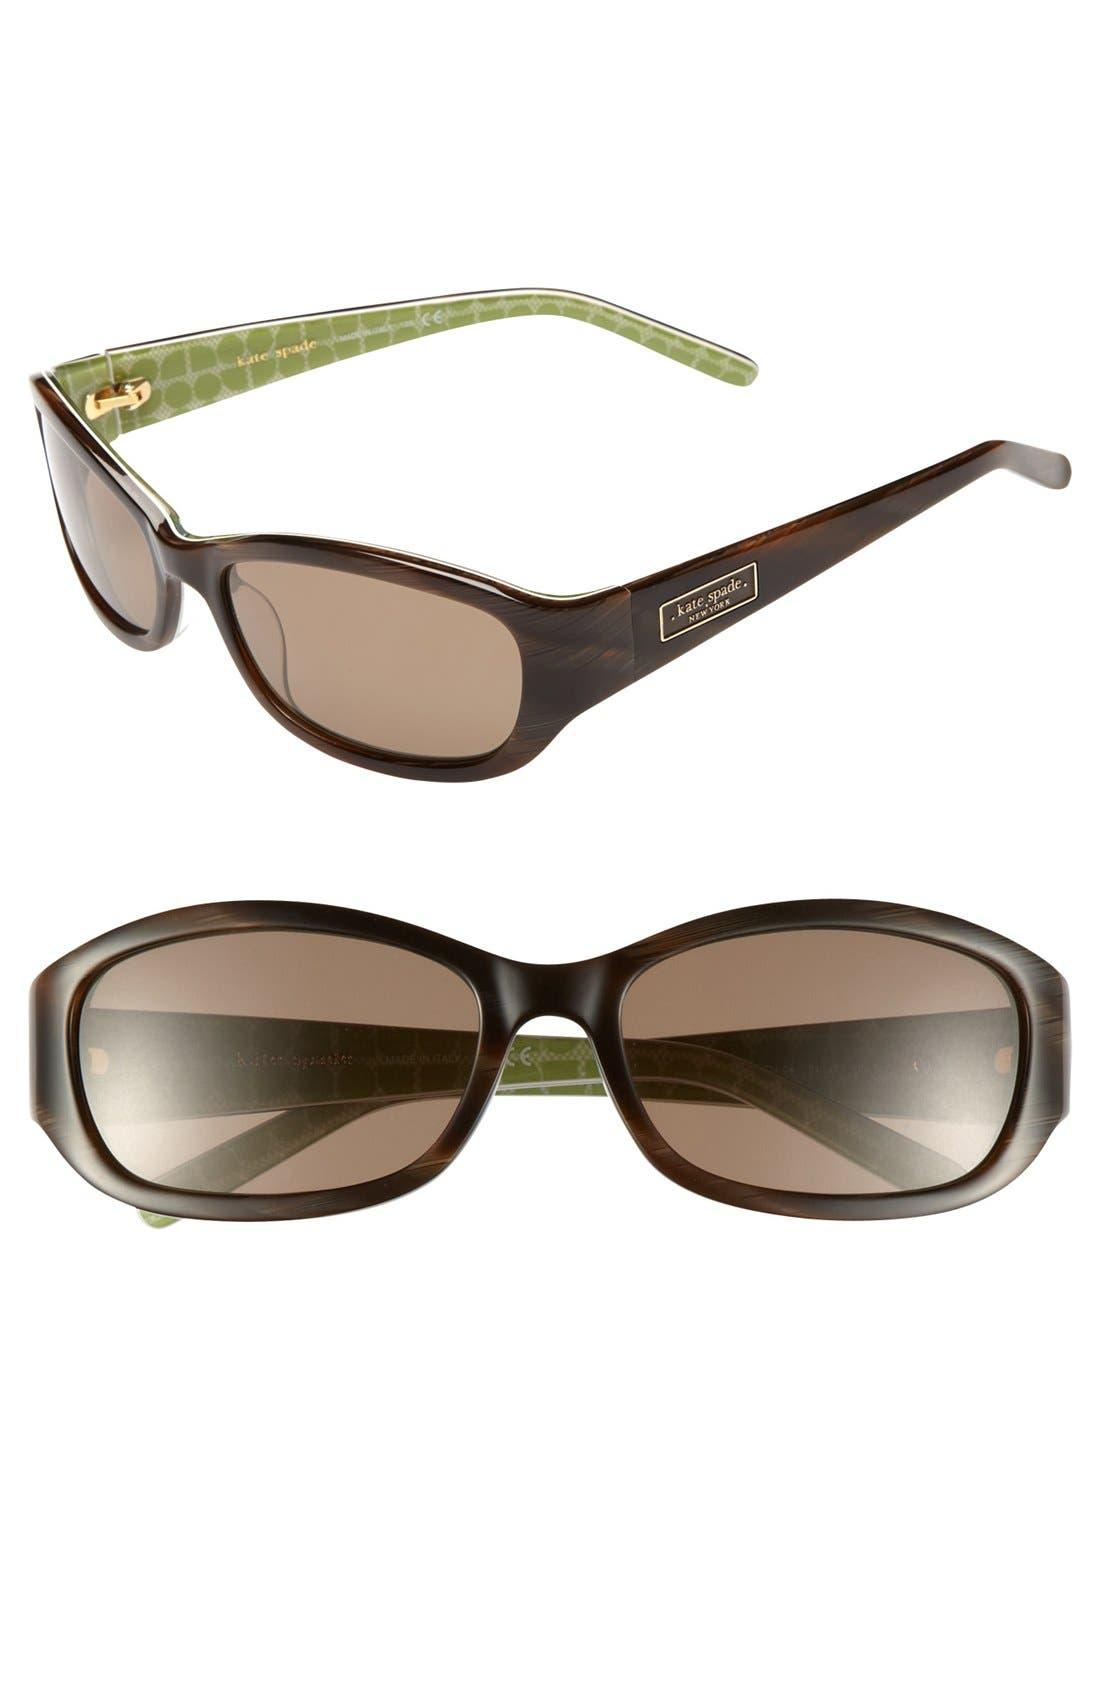 Main Image - kate spade 'dee' two-tone 54mm sunglasses